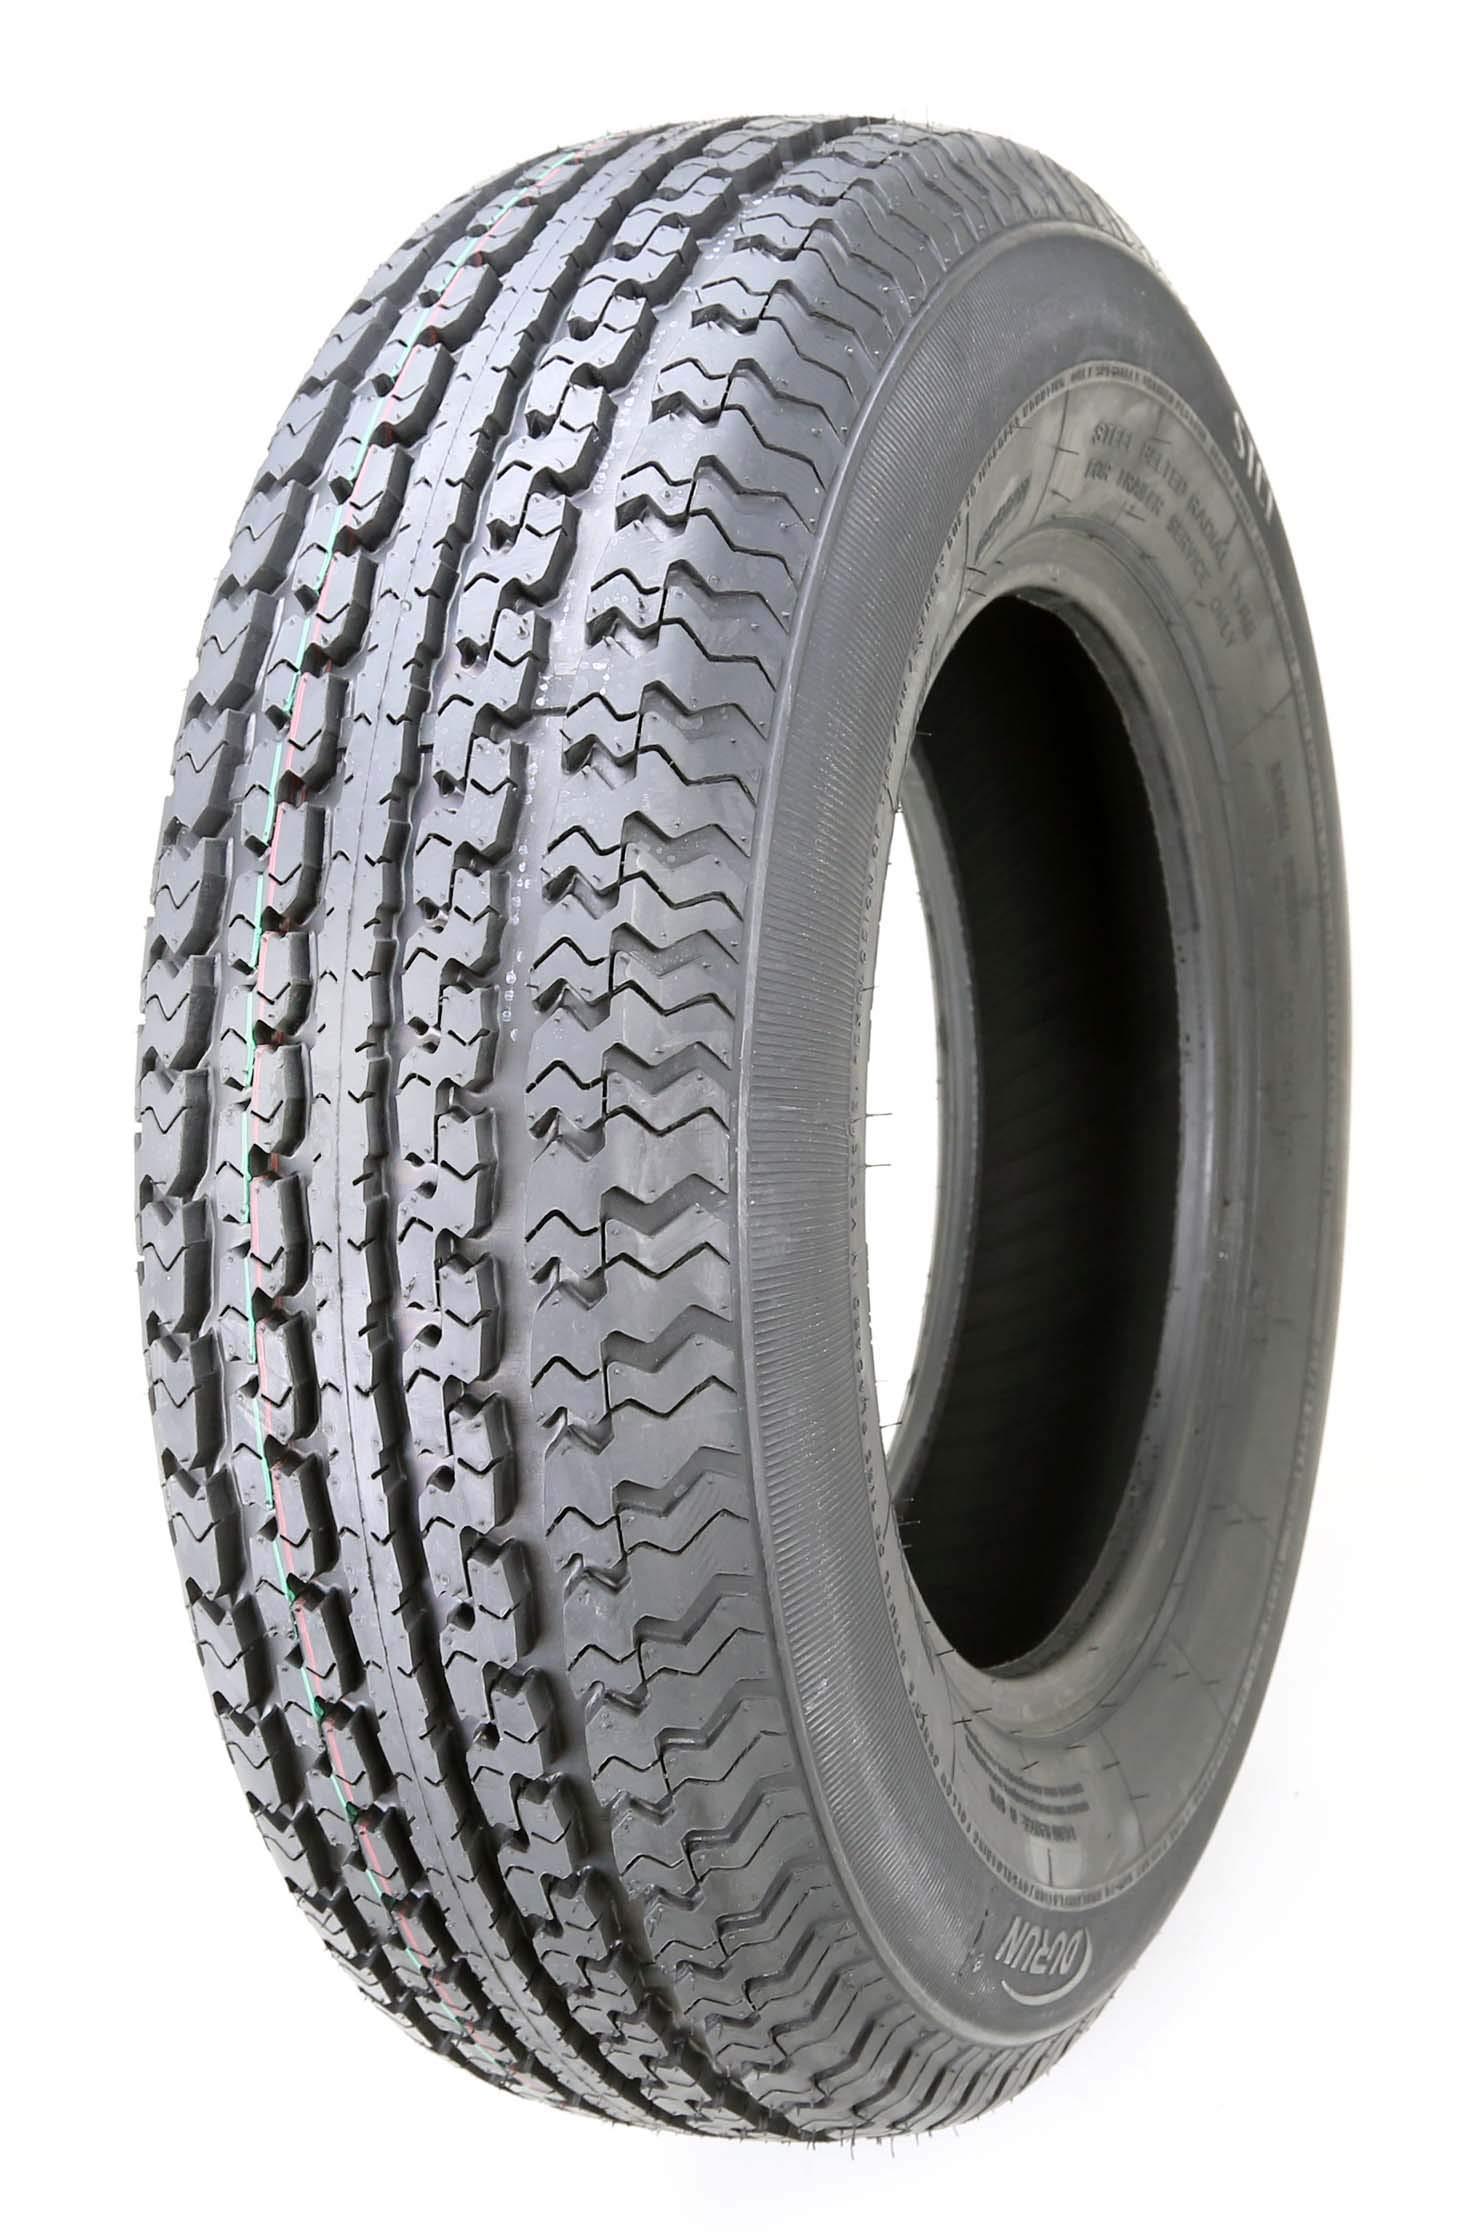 One New Premium DURUN Trailer Tire ST 205 75R15 / 8PR Load Range D Steel Belted